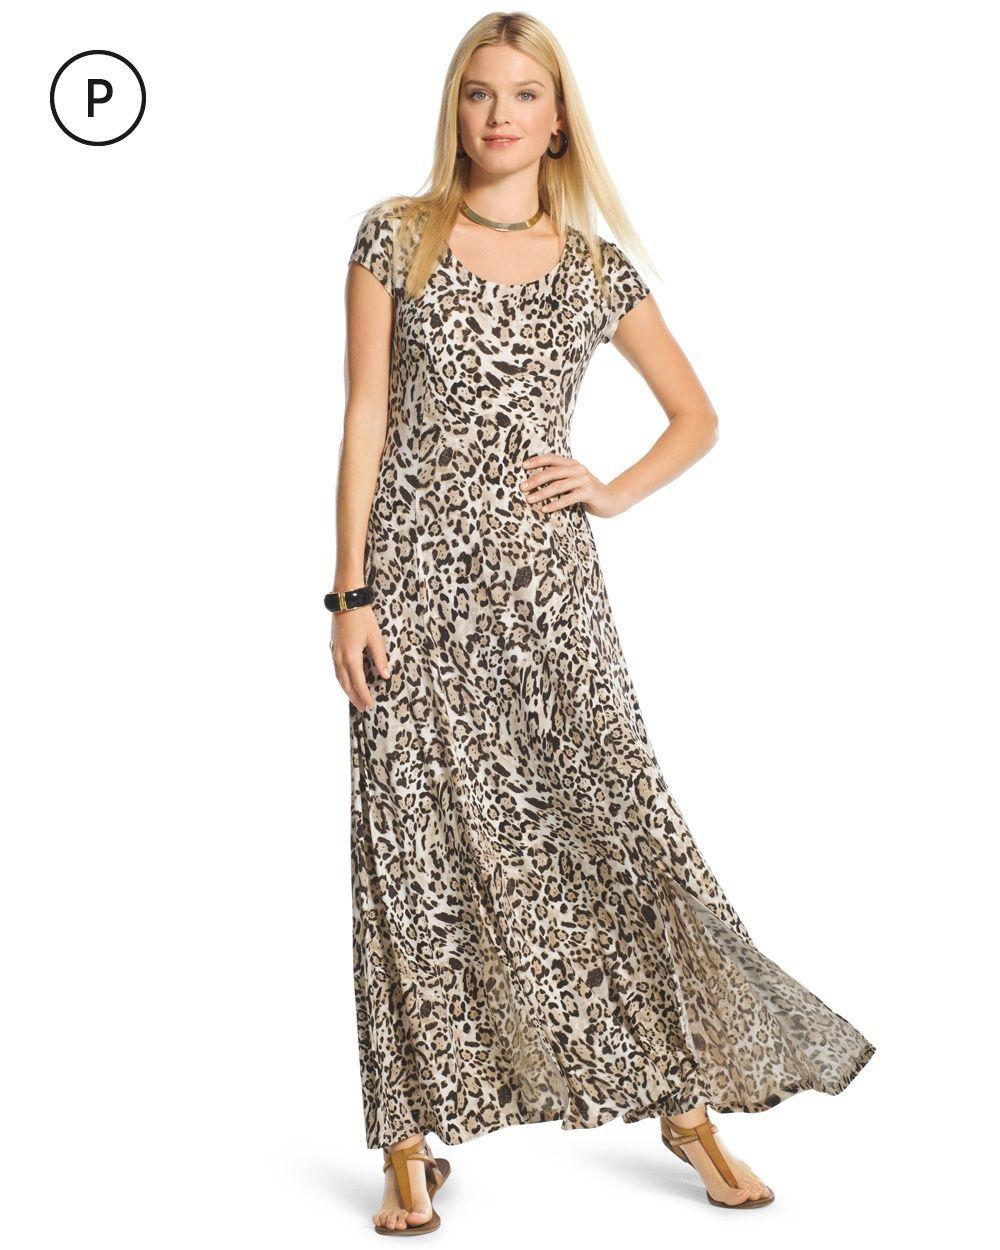 b8033fd99c Chico s Women s Petite Animal-Print Maxi Dress